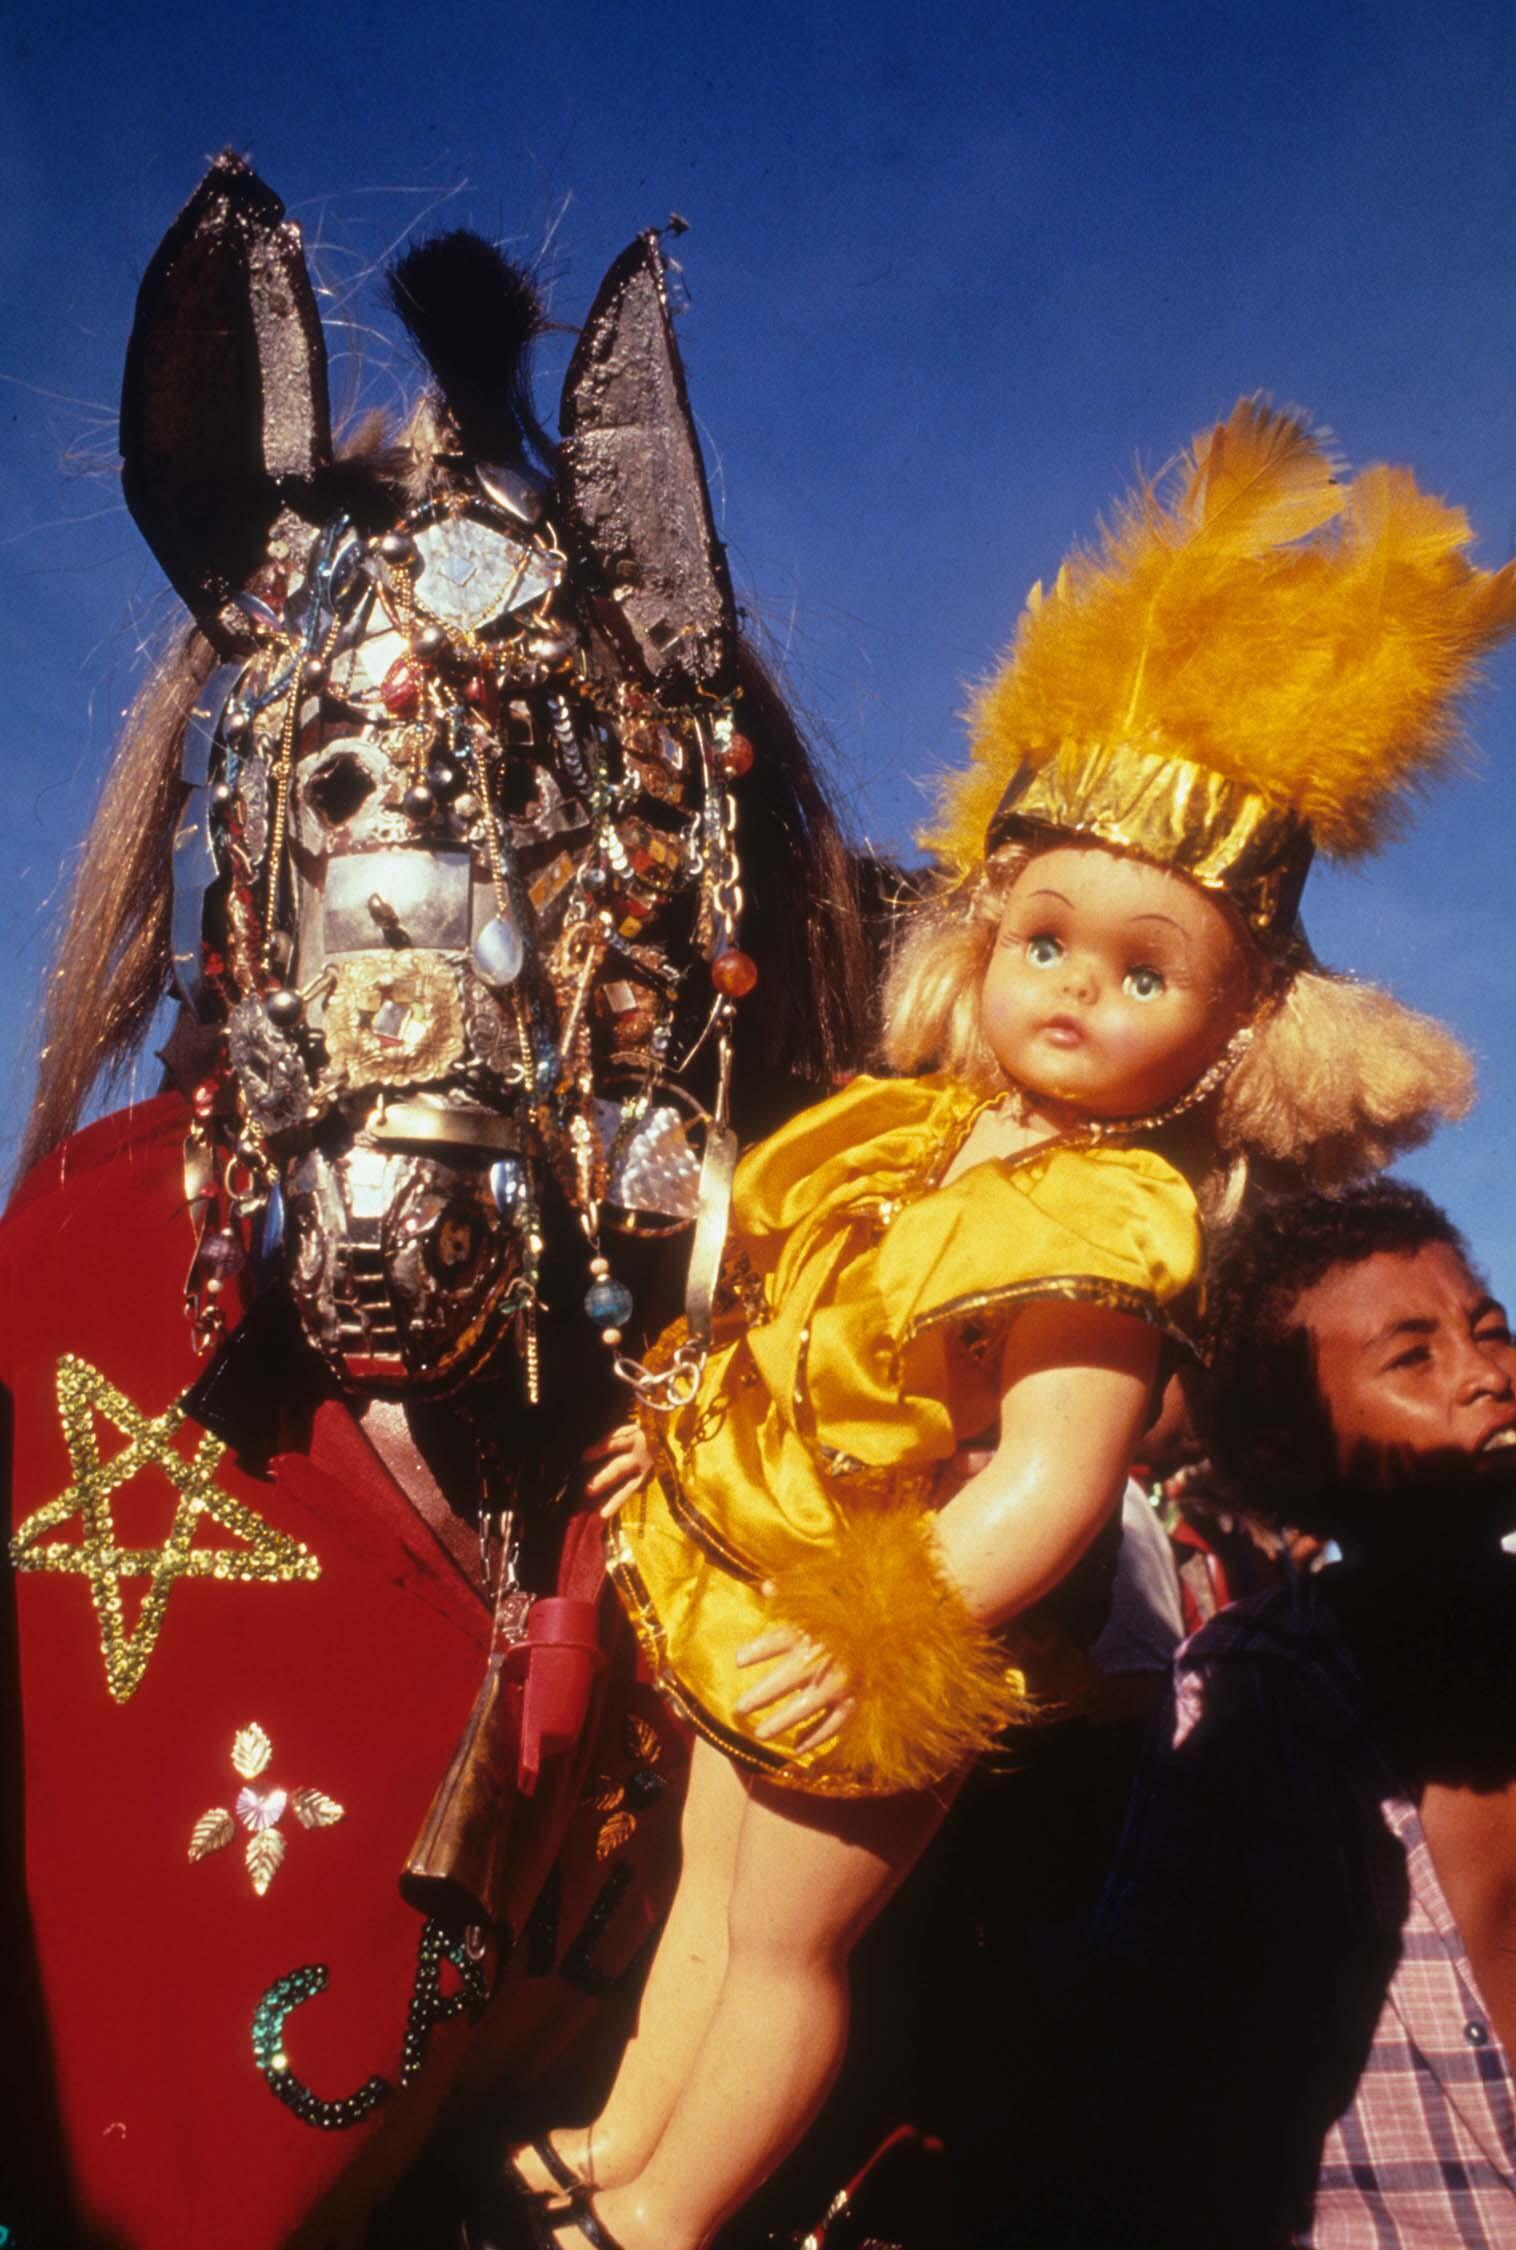 Rosa Gauditano percorreu o Brasil fotografando as festas populares.